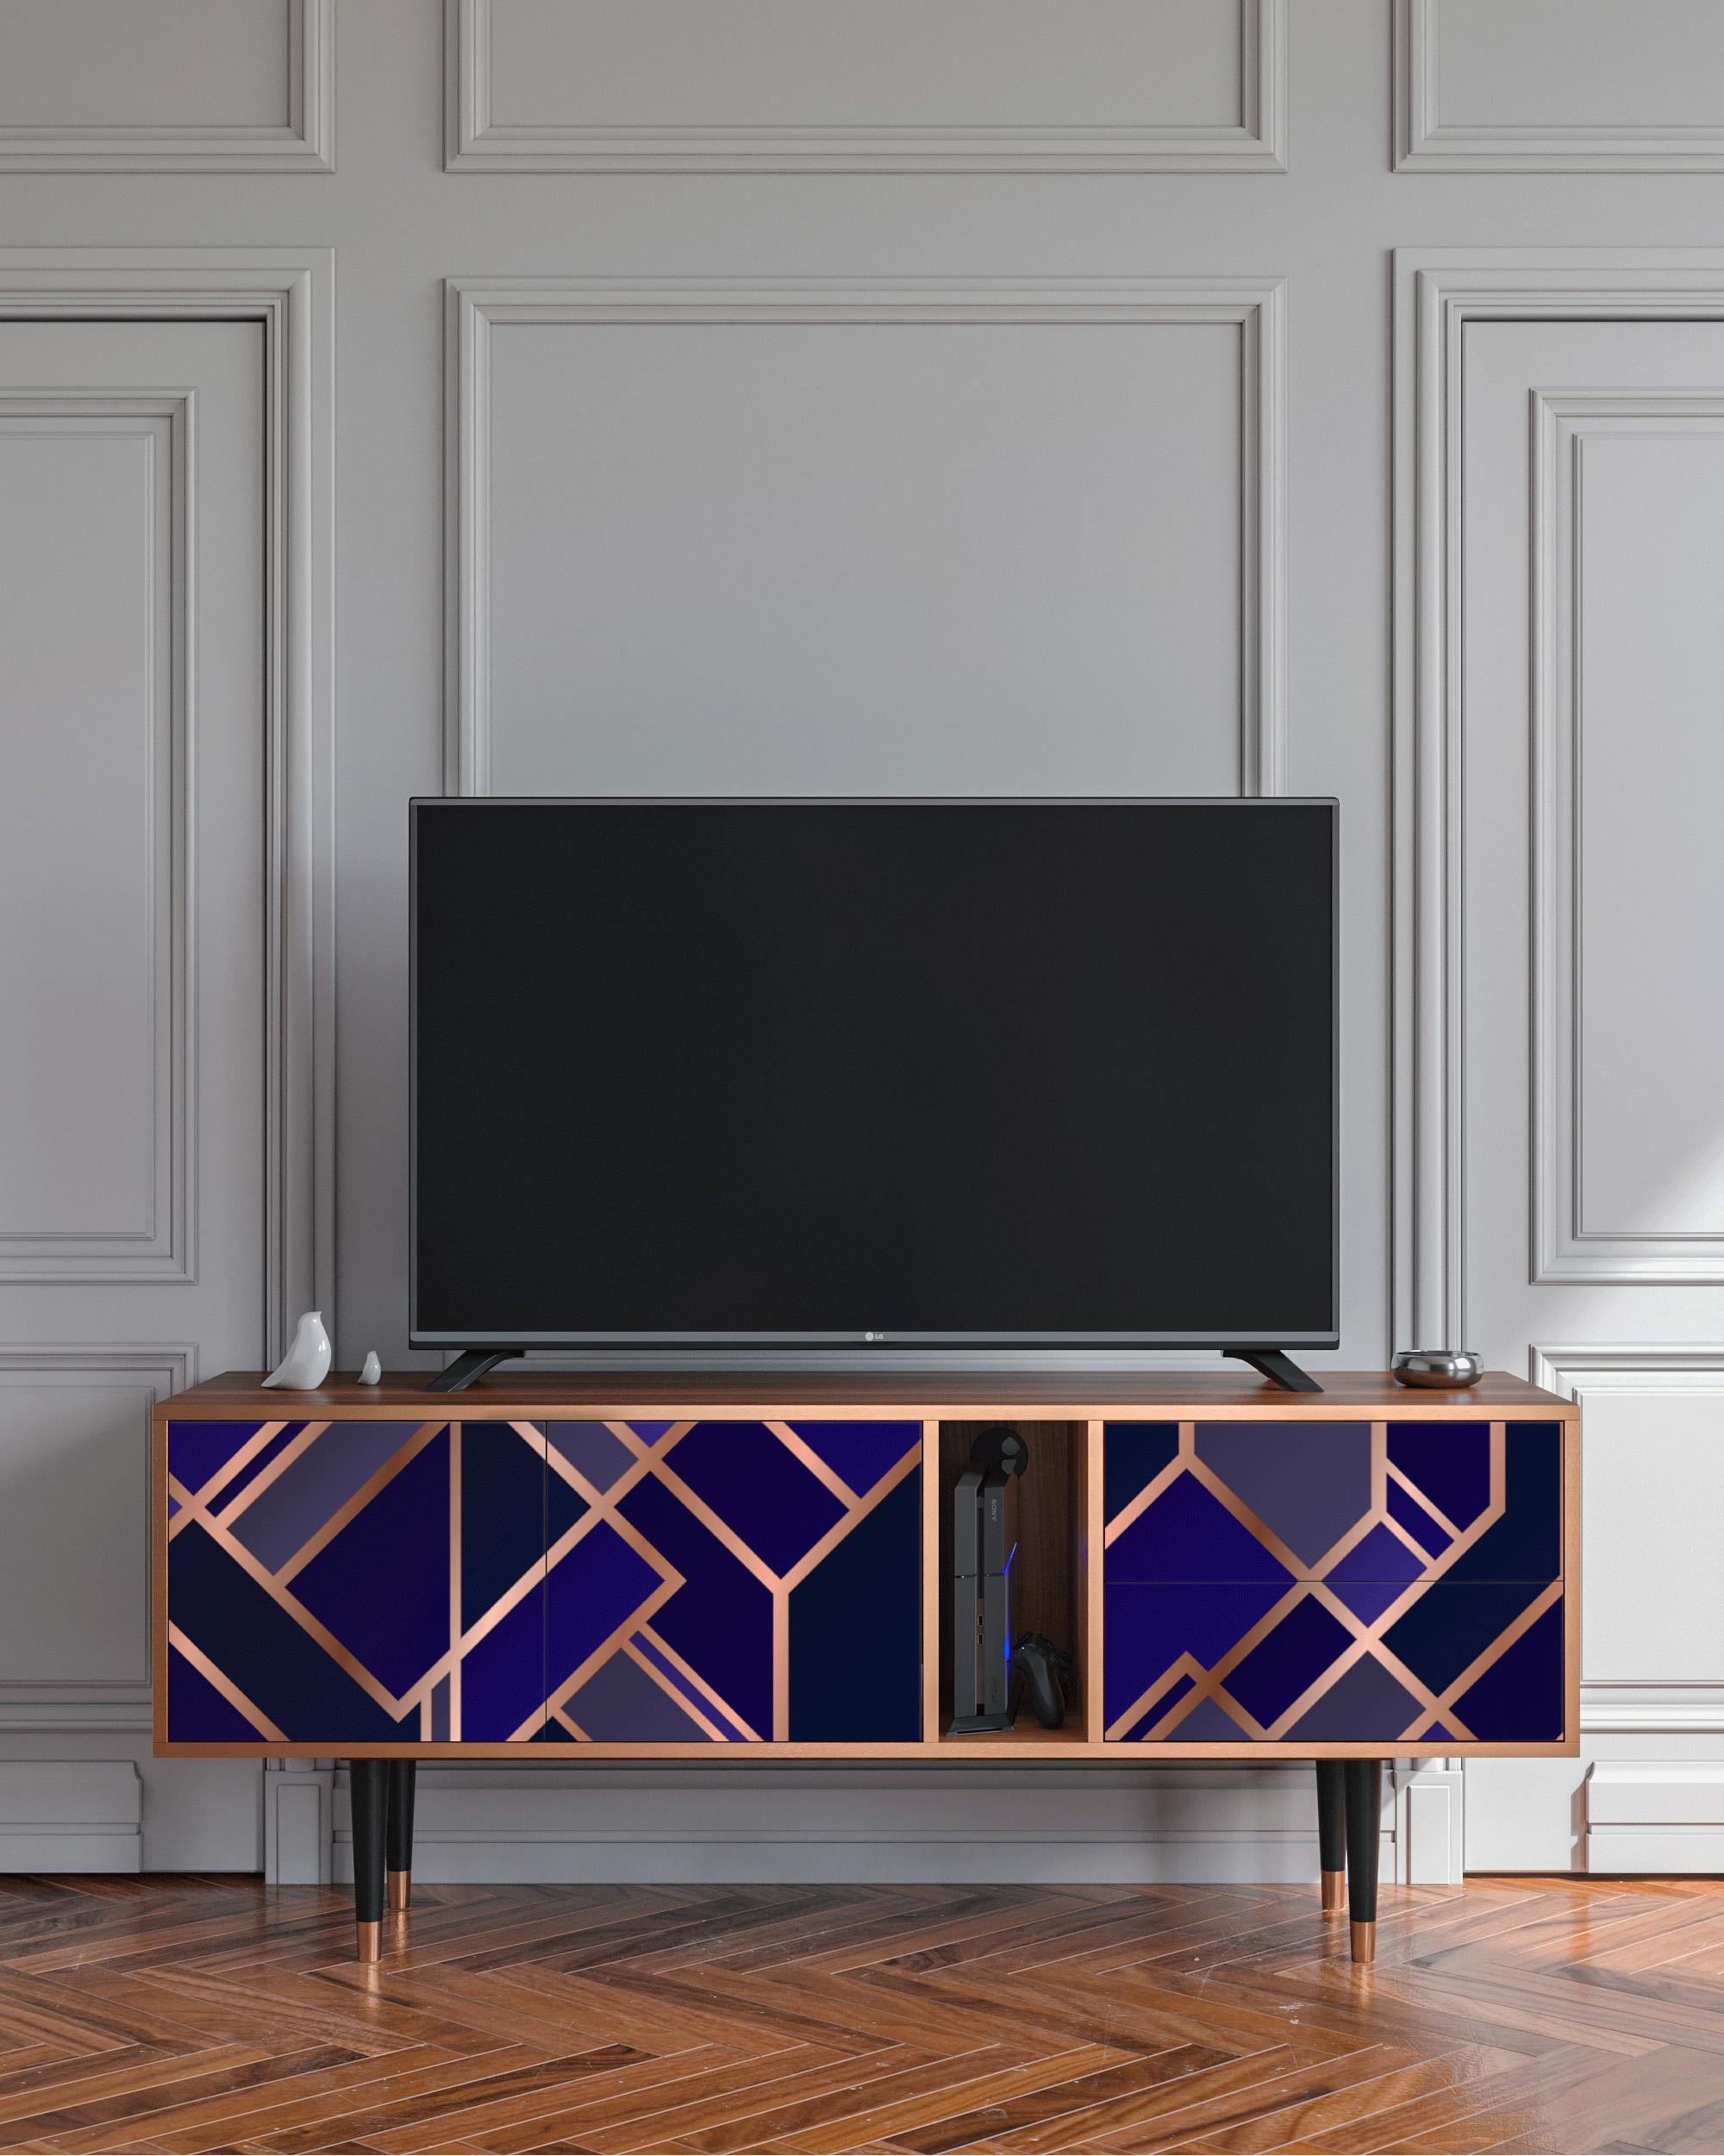 Meuble TV aigue-marine 170cm 2 tiroirs et 2 portes